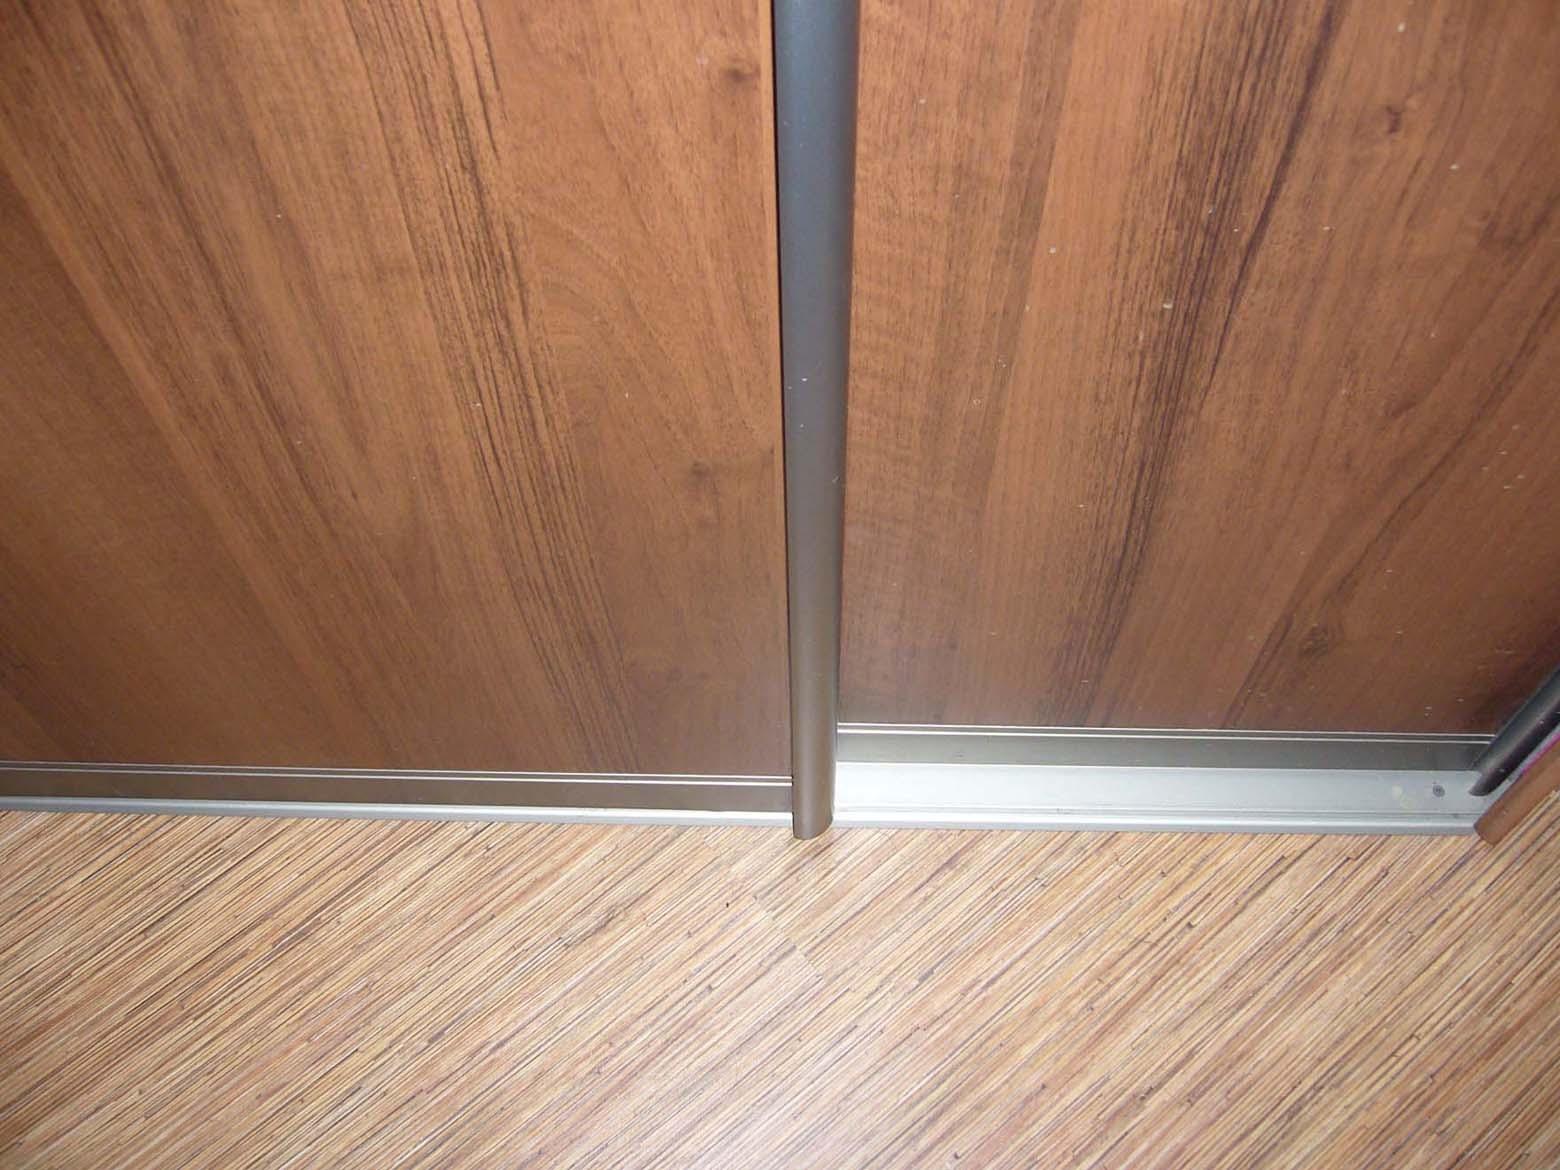 установка дверей шкафа